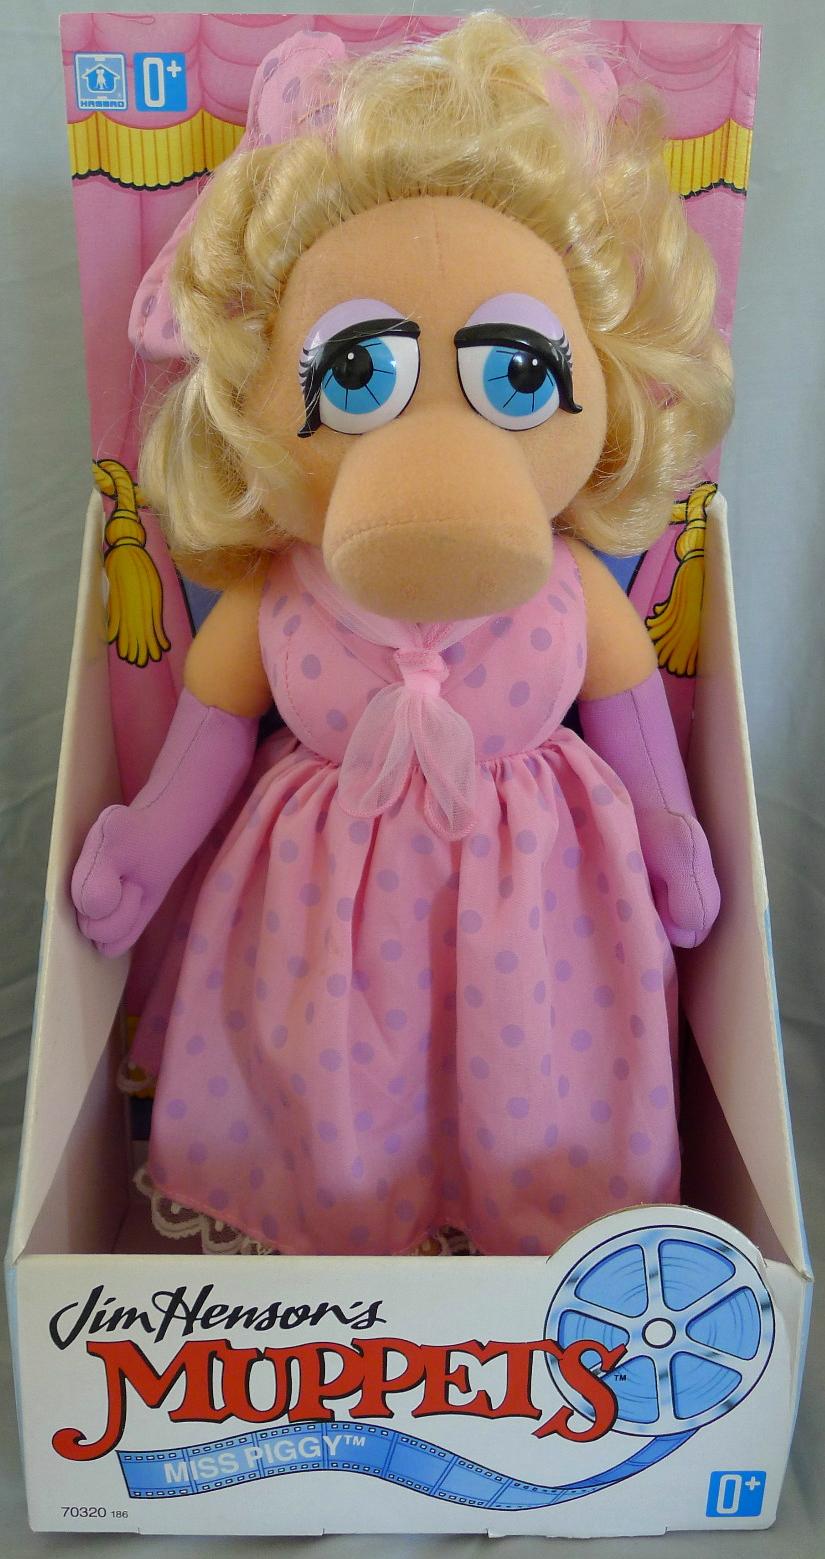 Muppet plush (Child Dimension)